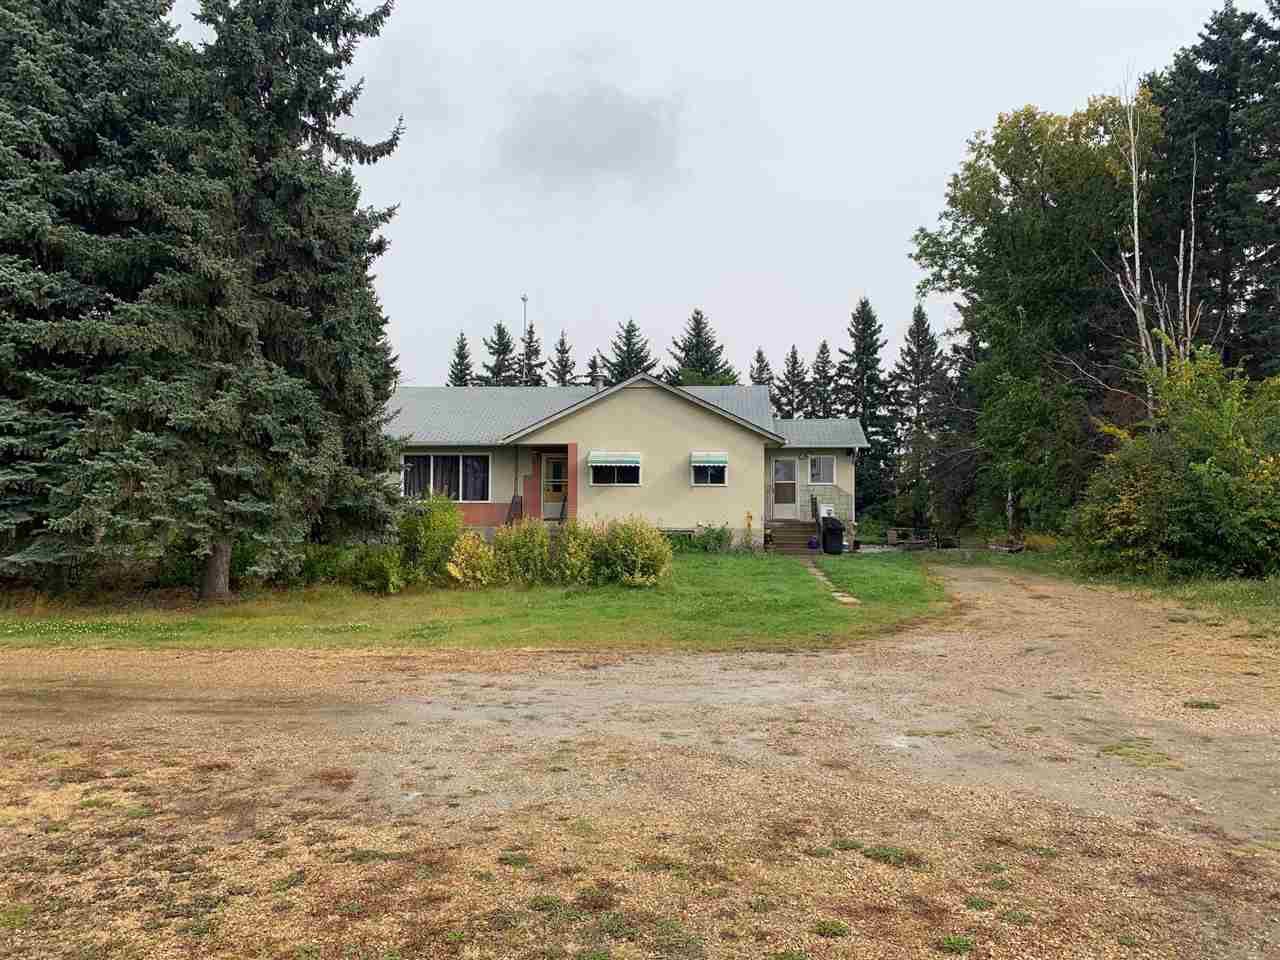 Main Photo: 24509 TWP RD 542: Rural Sturgeon County House for sale : MLS®# E4175743